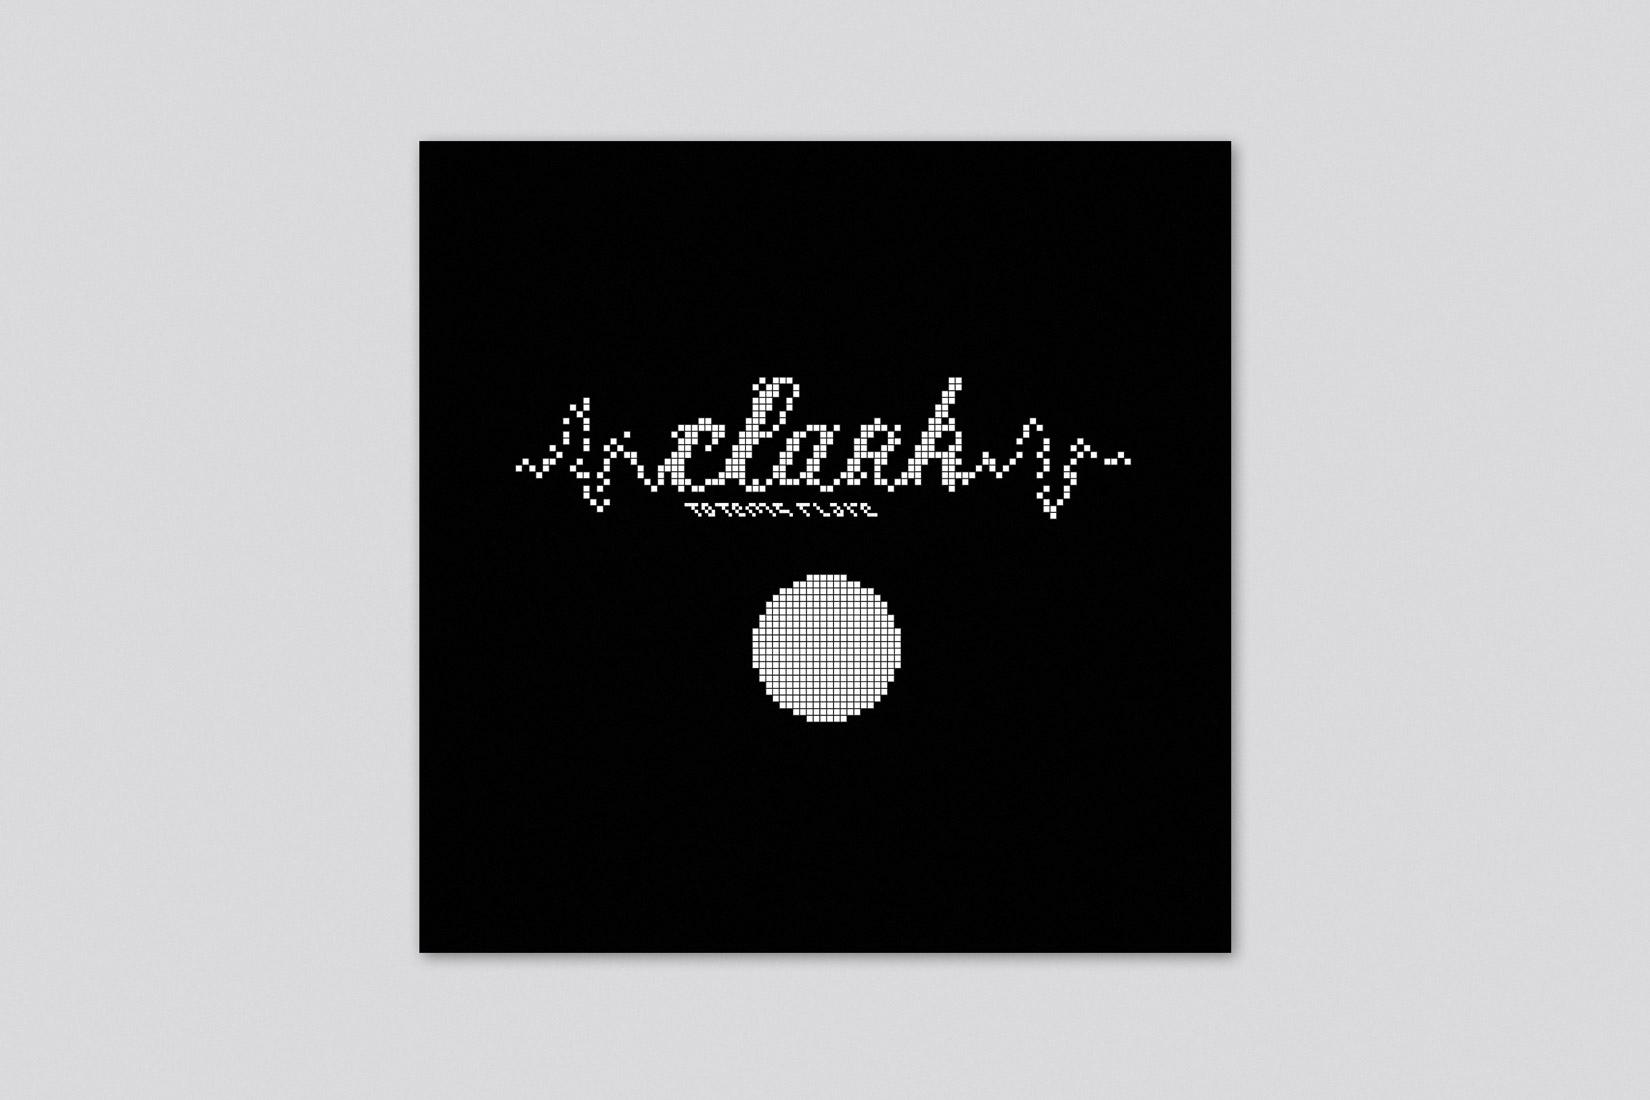 pochette album typographie